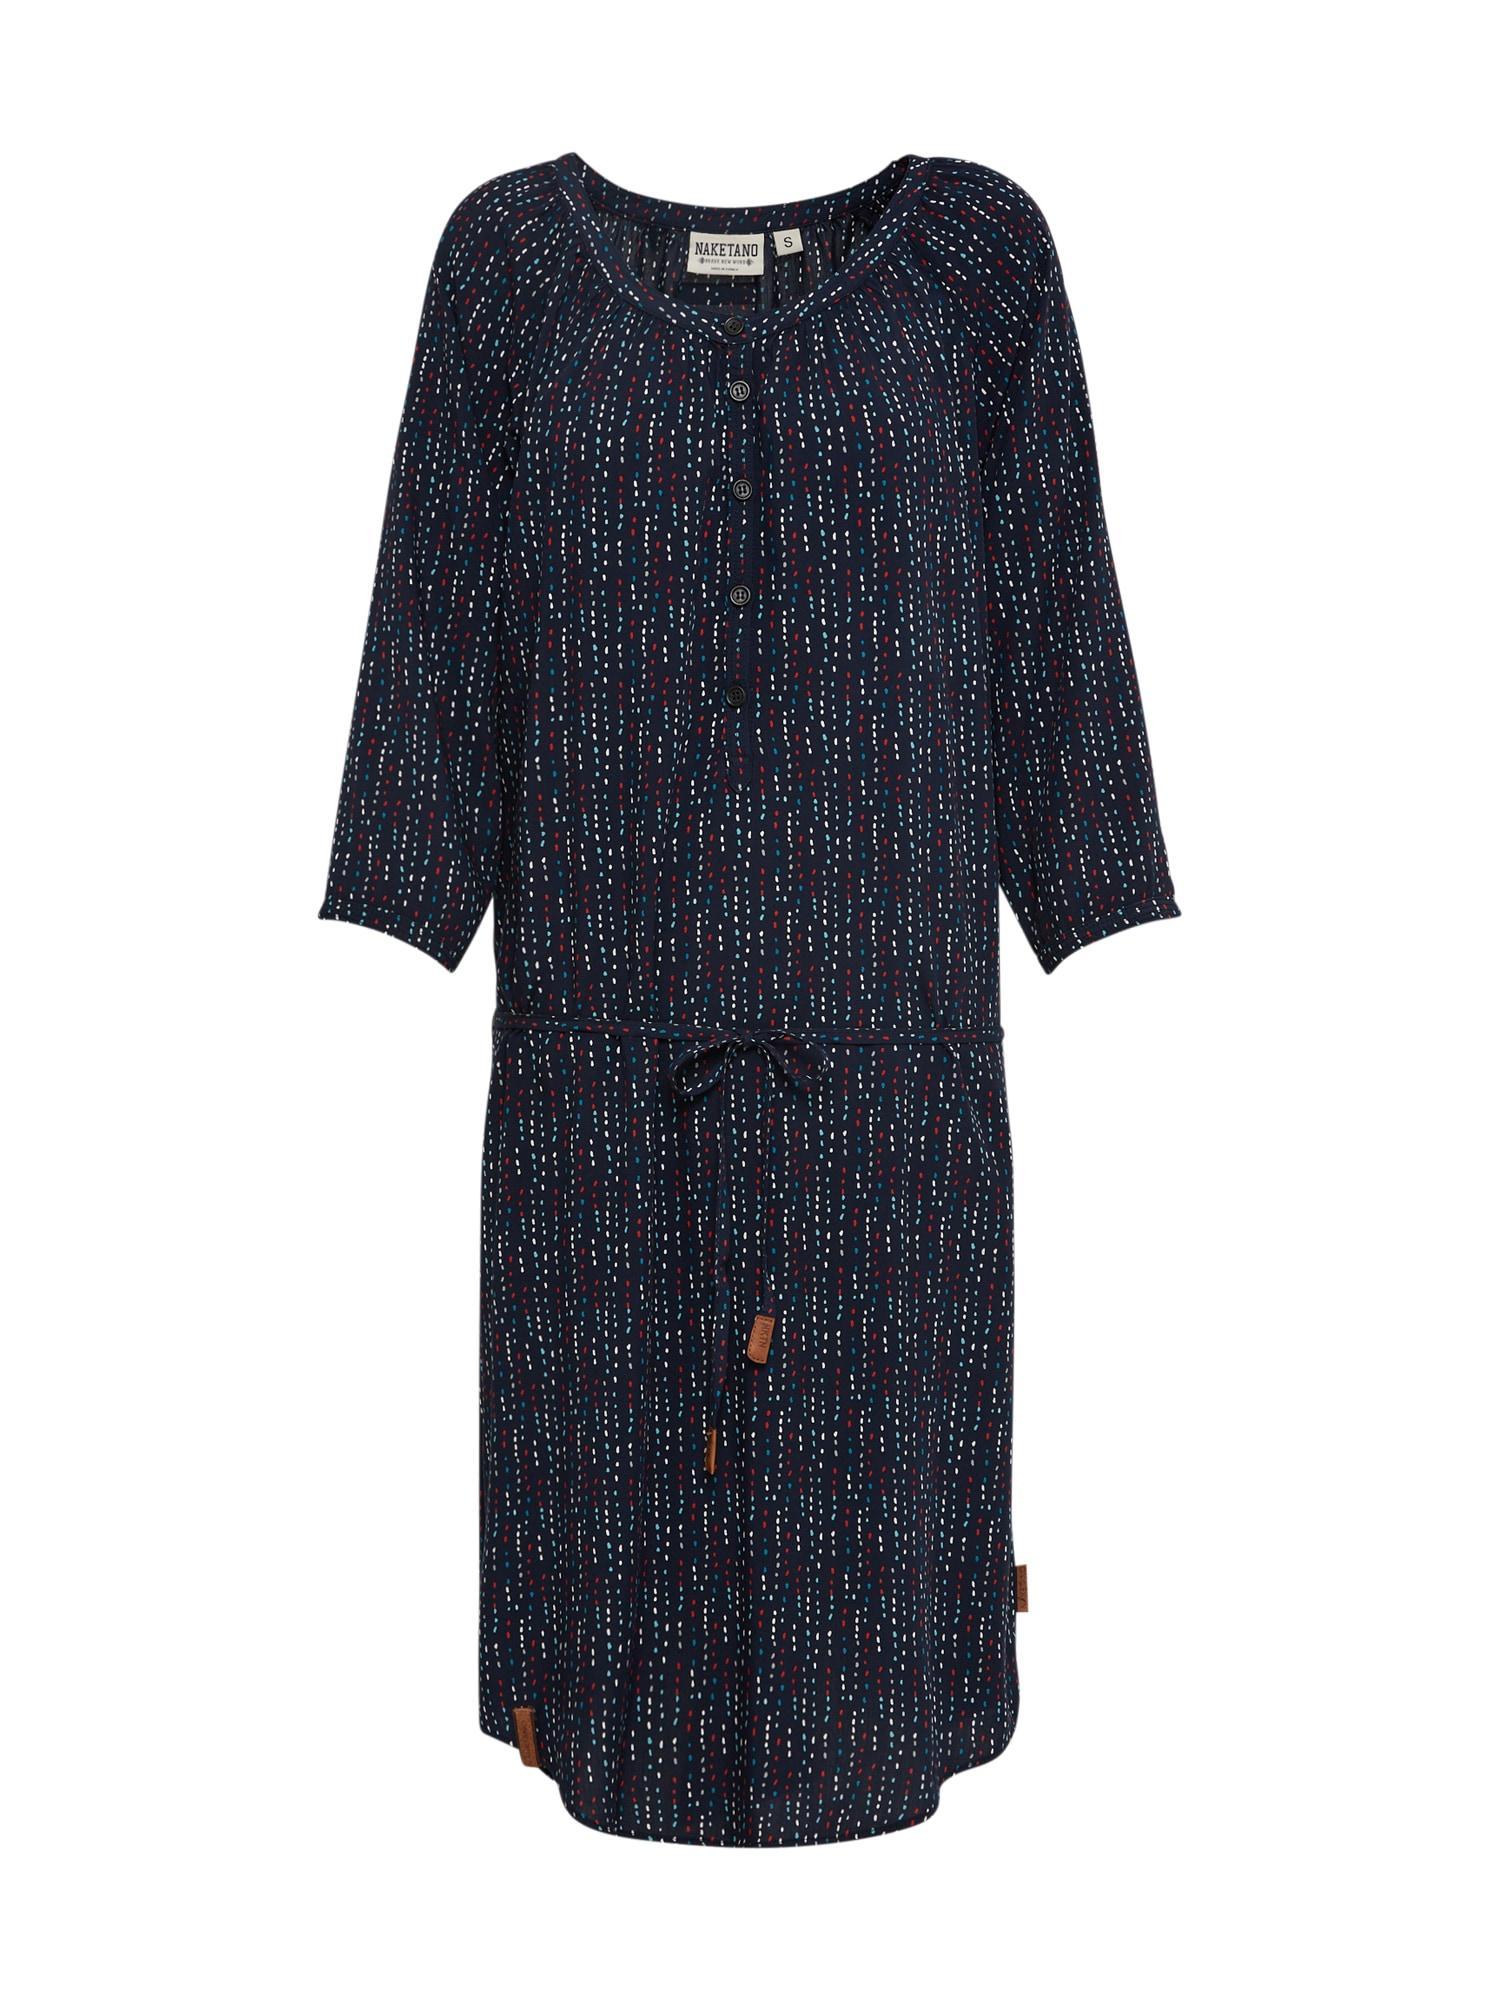 Šaty tmavě modrá mix barev Naketano